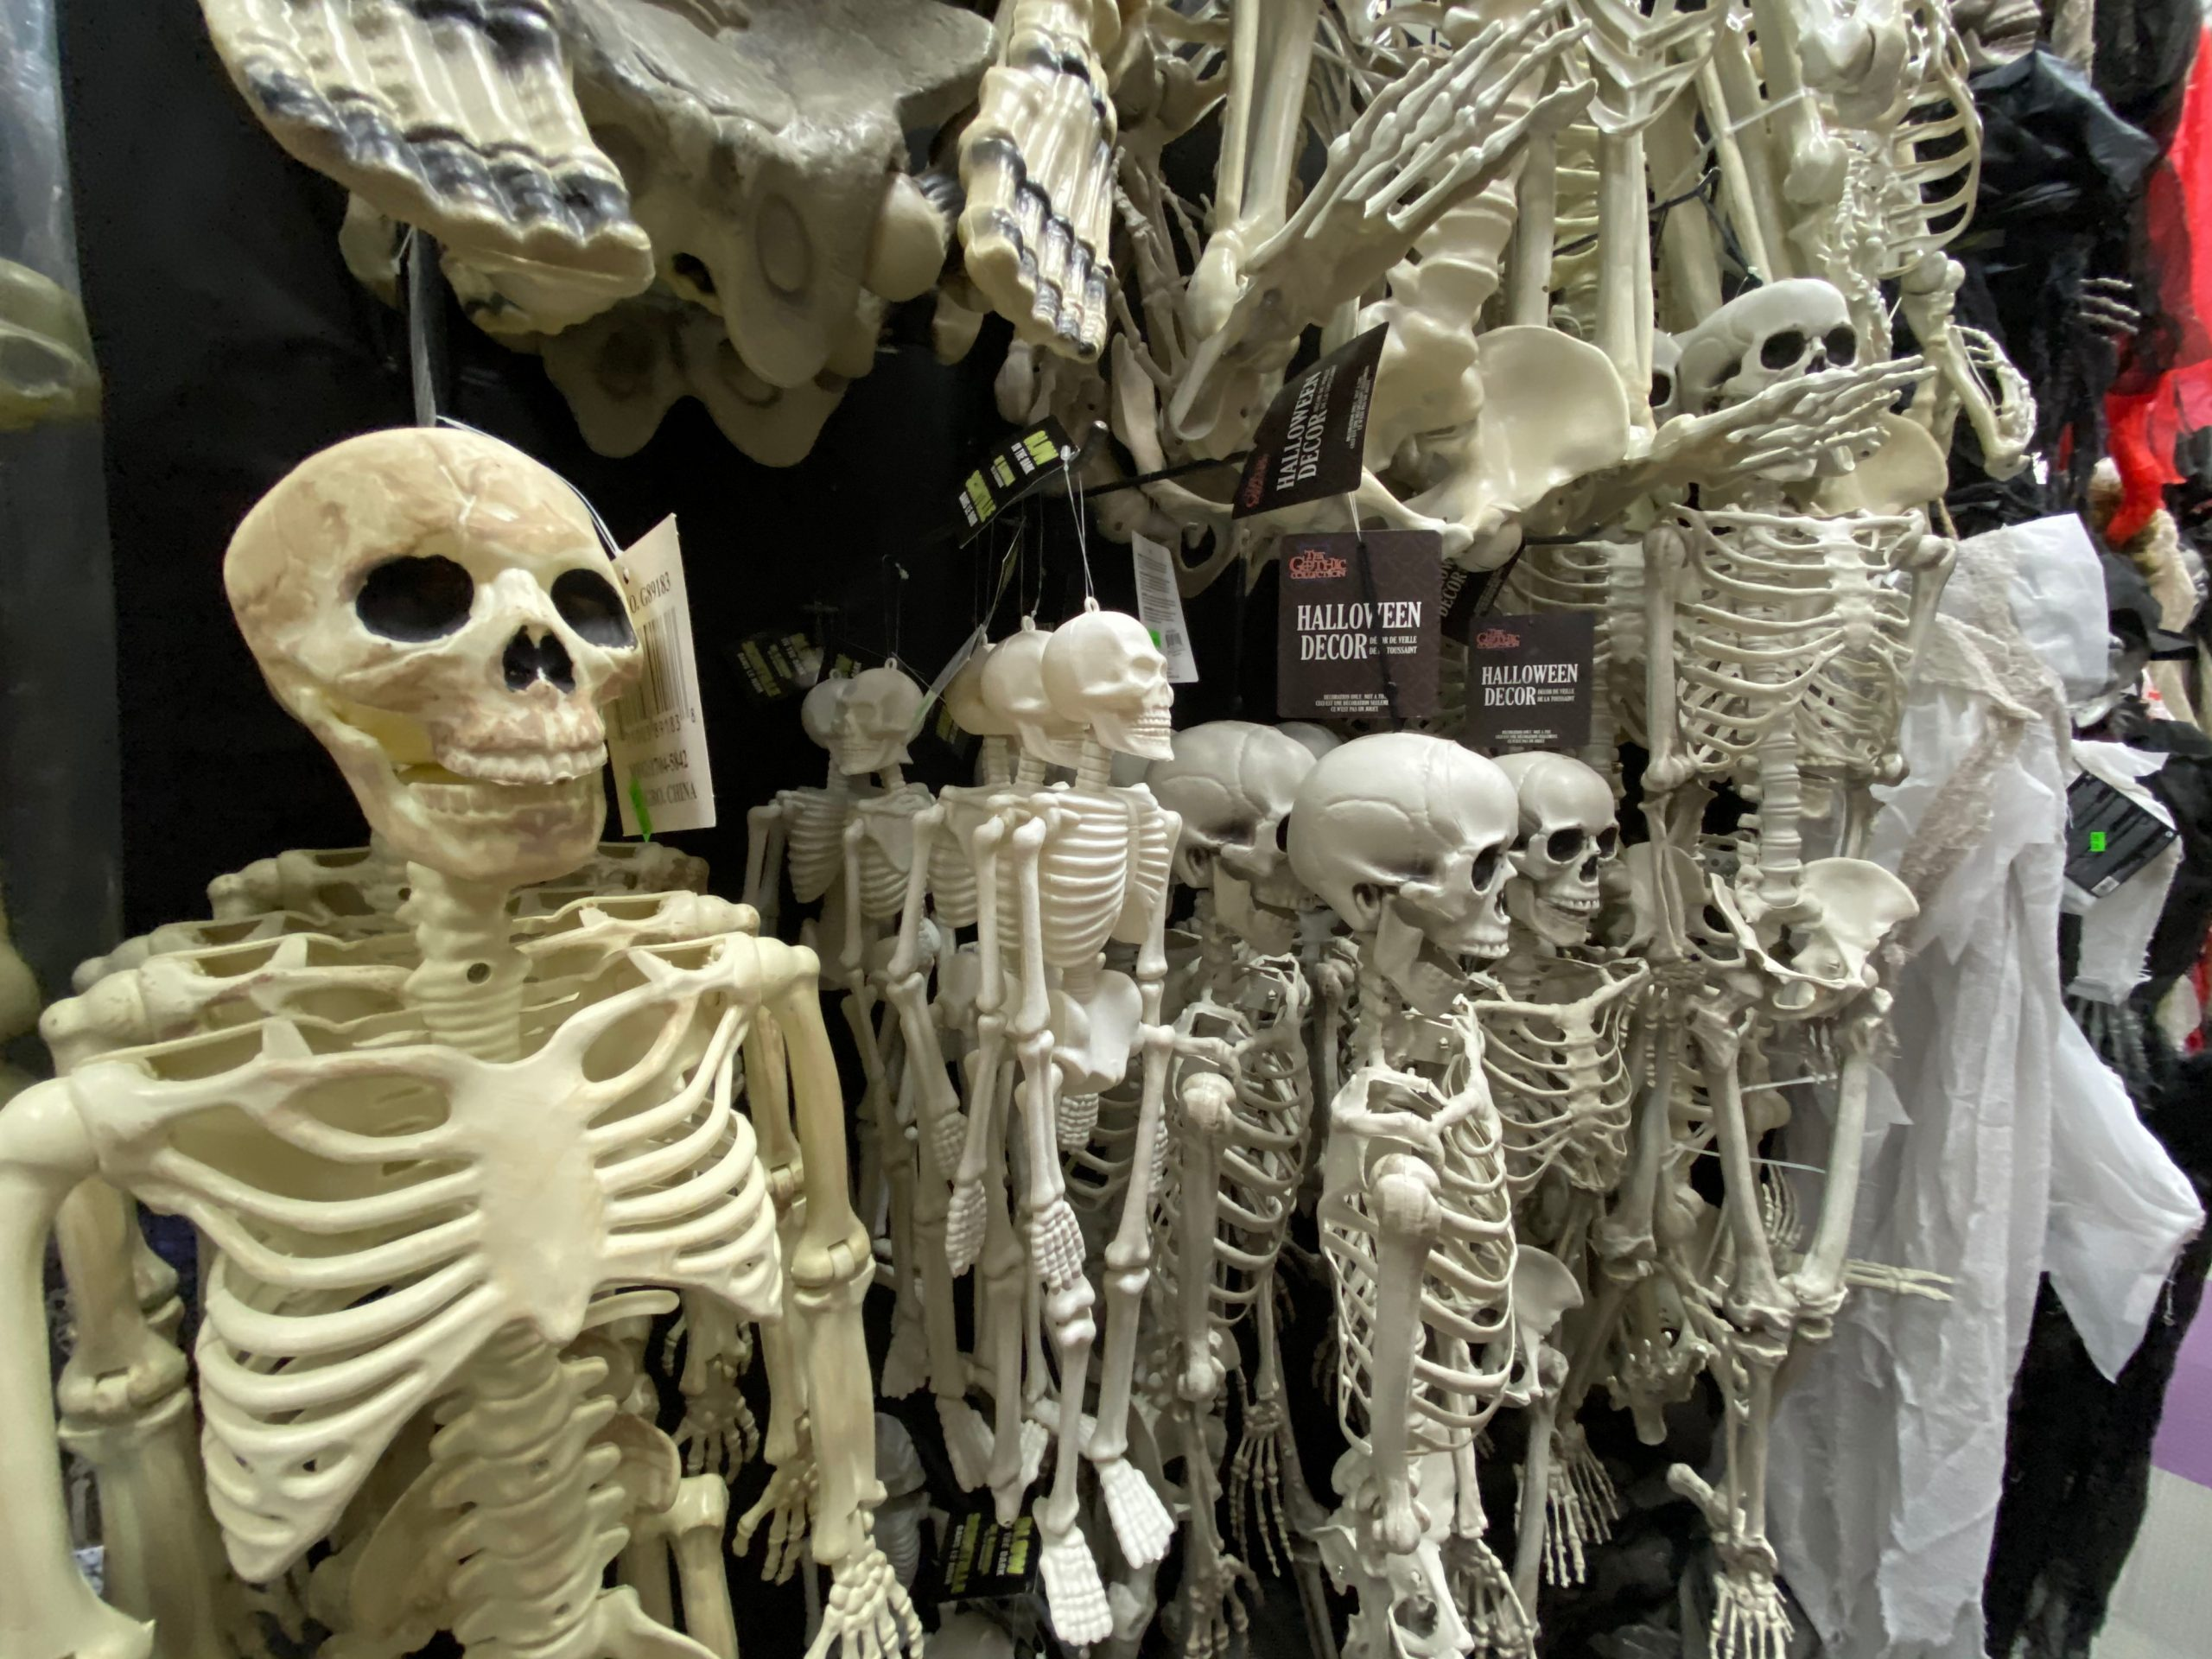 Halloween Decor in Baton Rouge